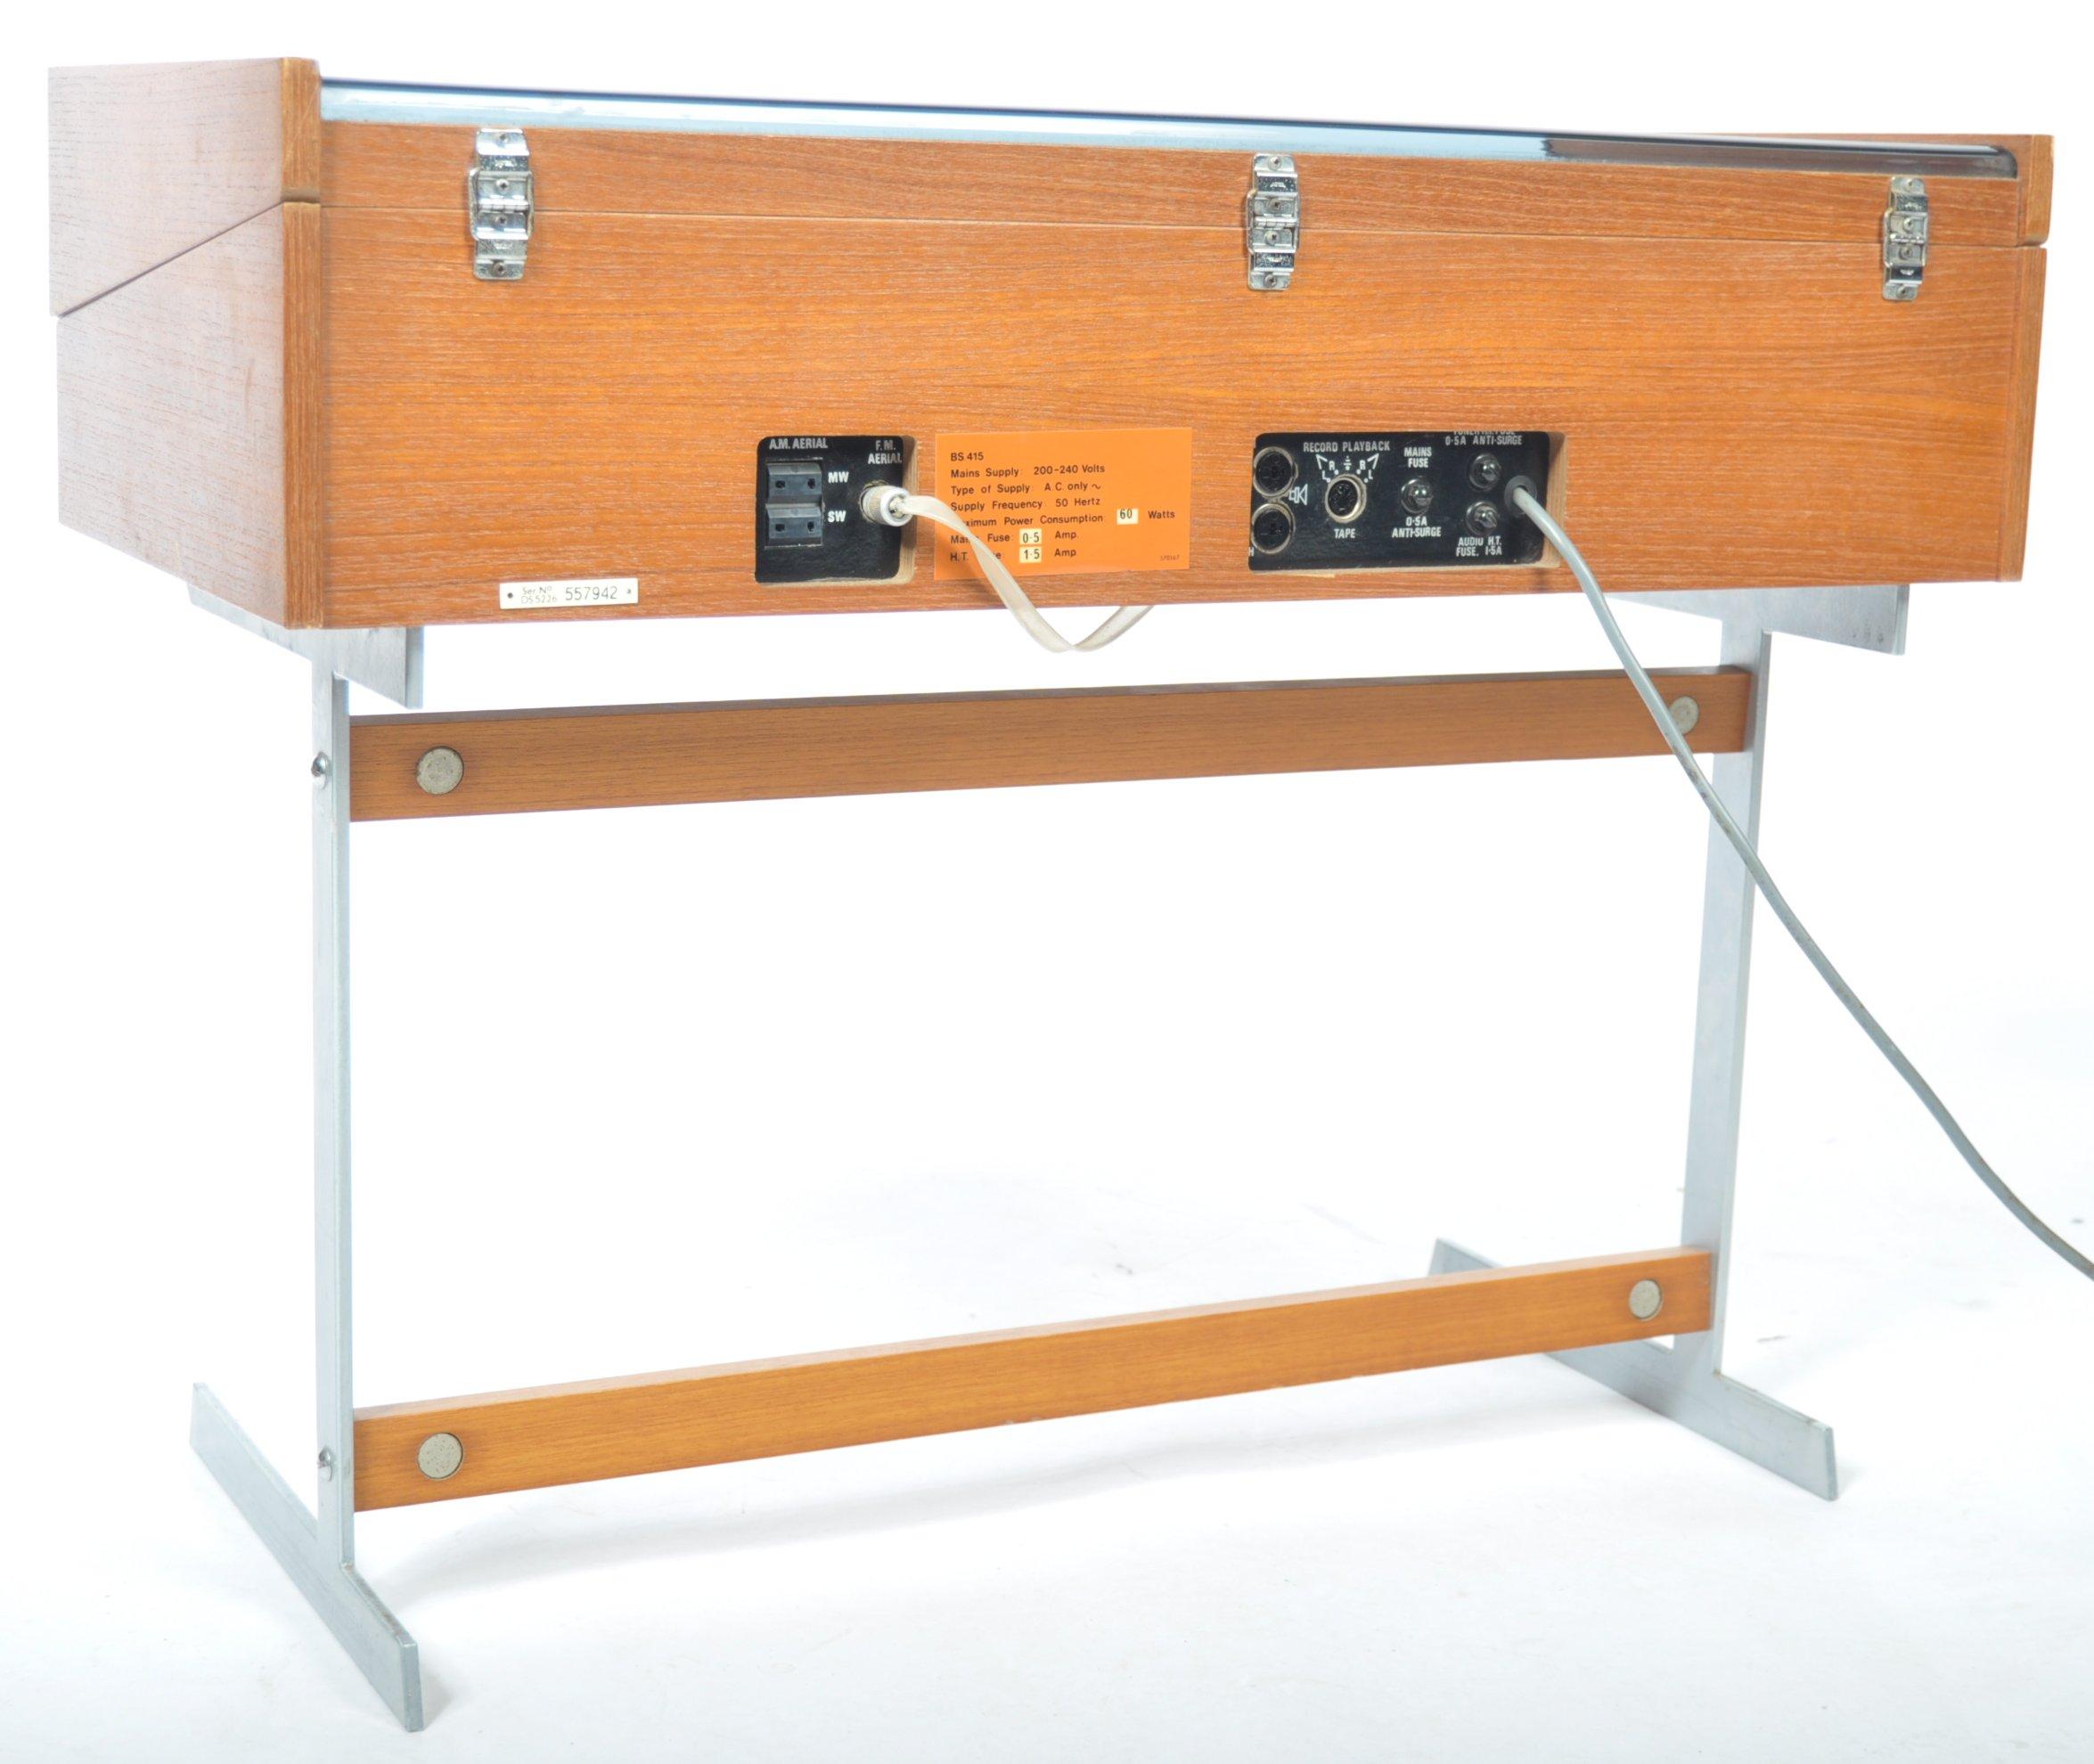 STUNNING DECCA SOUND TEAK CASED AUDIO SYSTEM RAISED ON CHROME SUPPORTS - Image 6 of 8